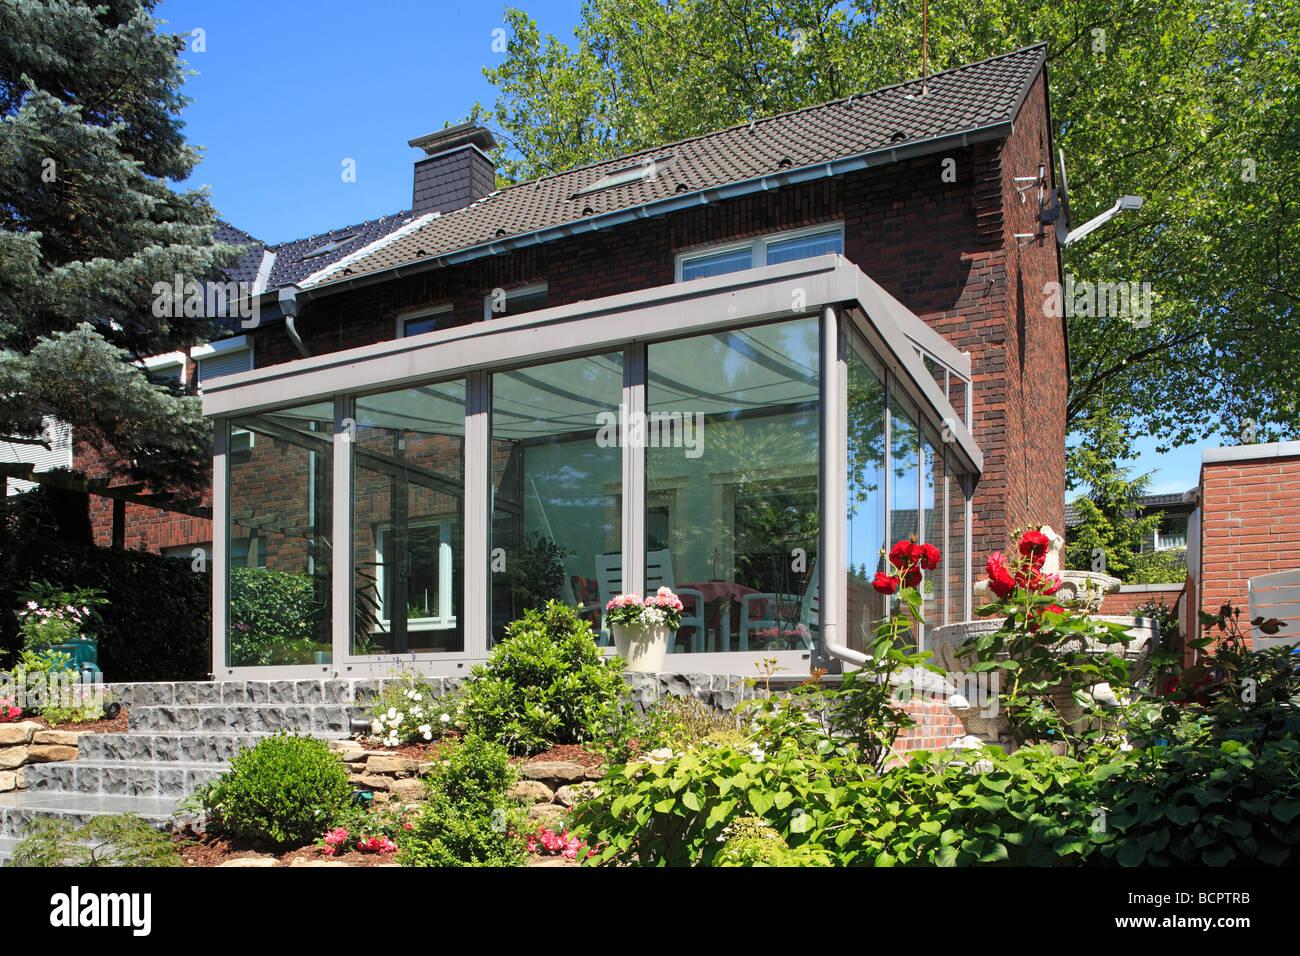 Giardino Dinverno In Casa : Giardino d inverno e casa residenziale casa fila lato giardino